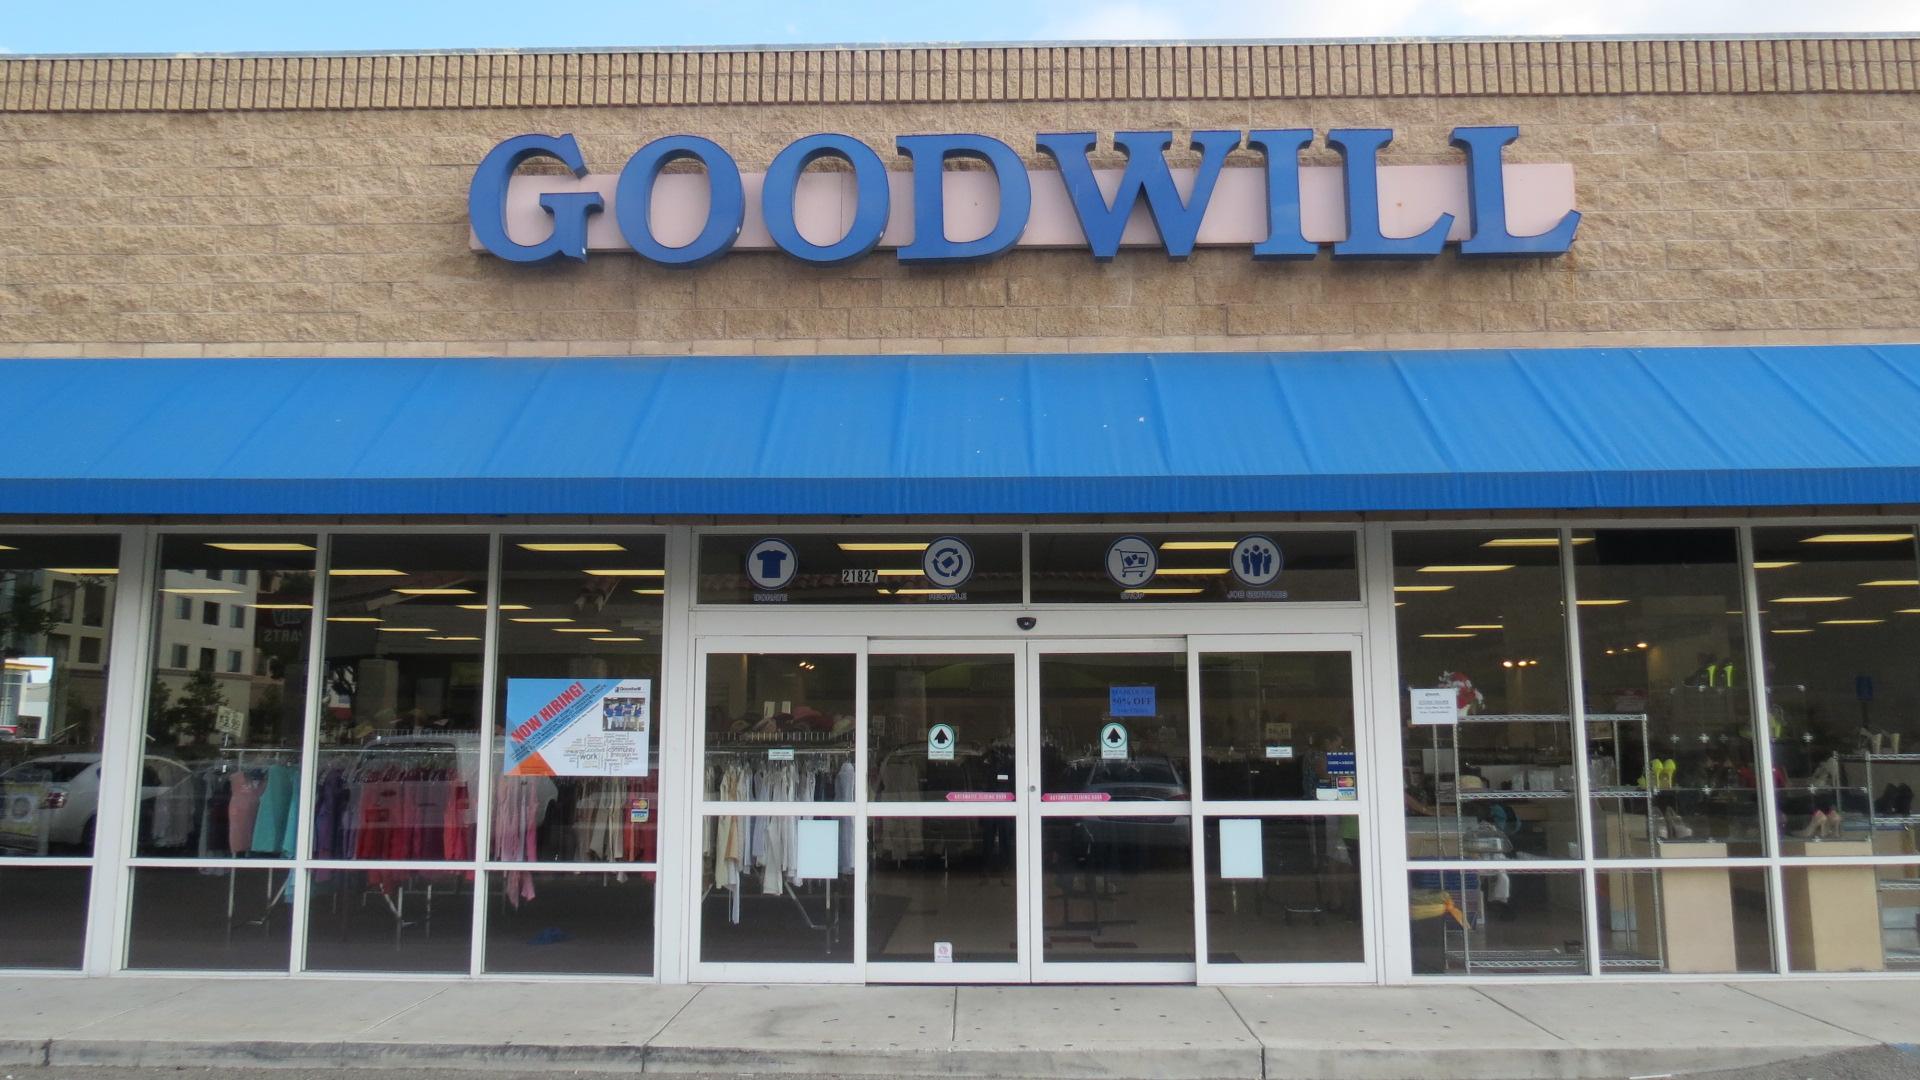 Carson Goodwill Retail Store & Donation Center